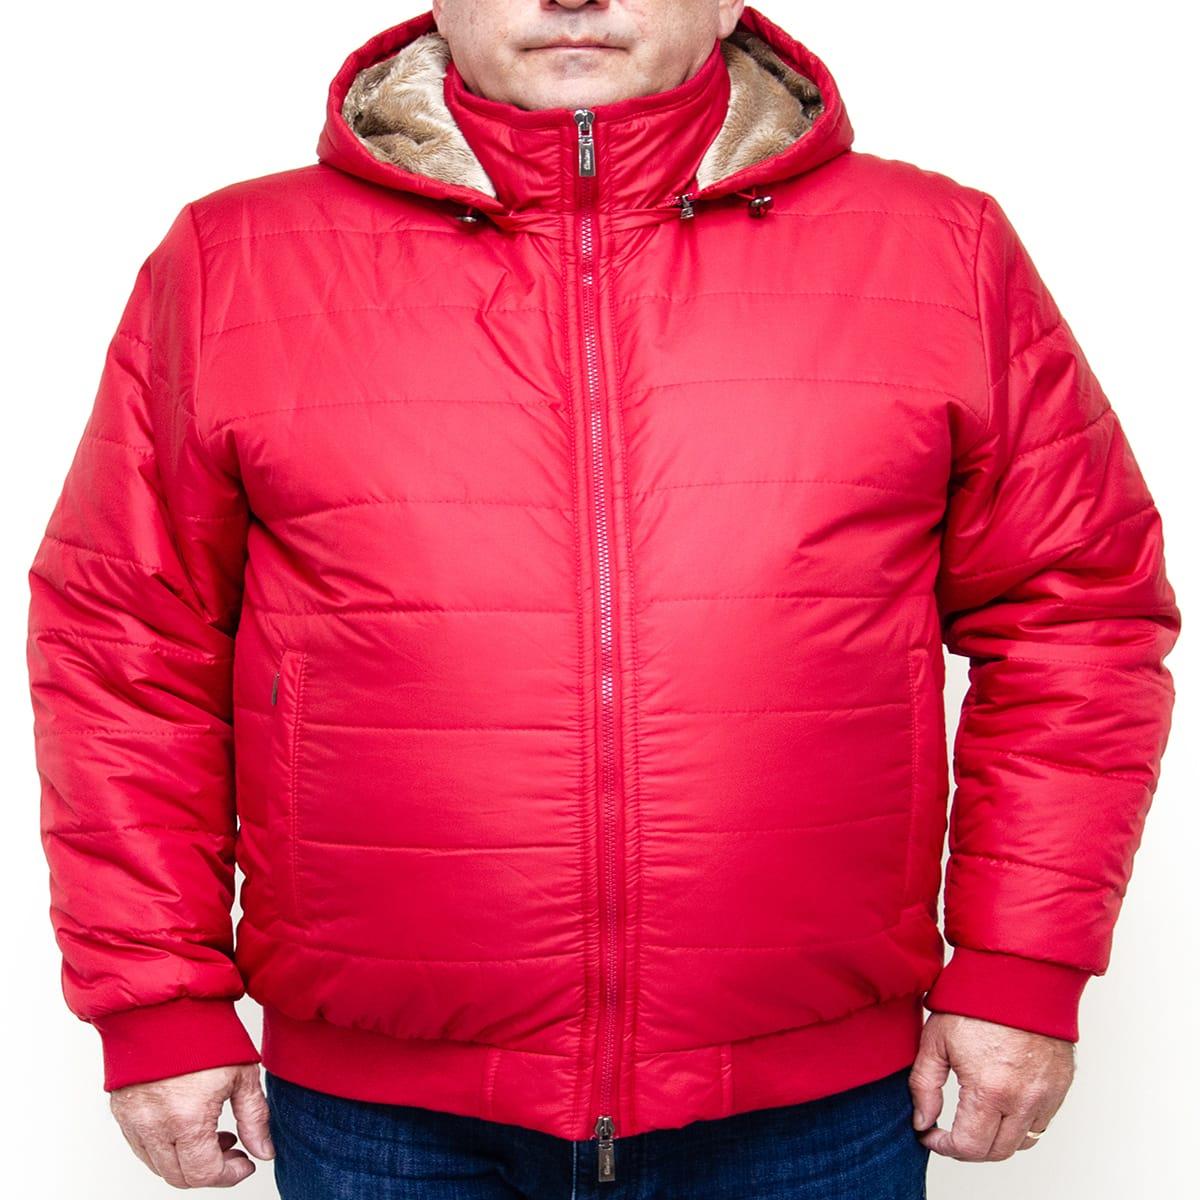 Geaca de iarna rosie cu gluga din fas , Marime 3XL - egato.ro